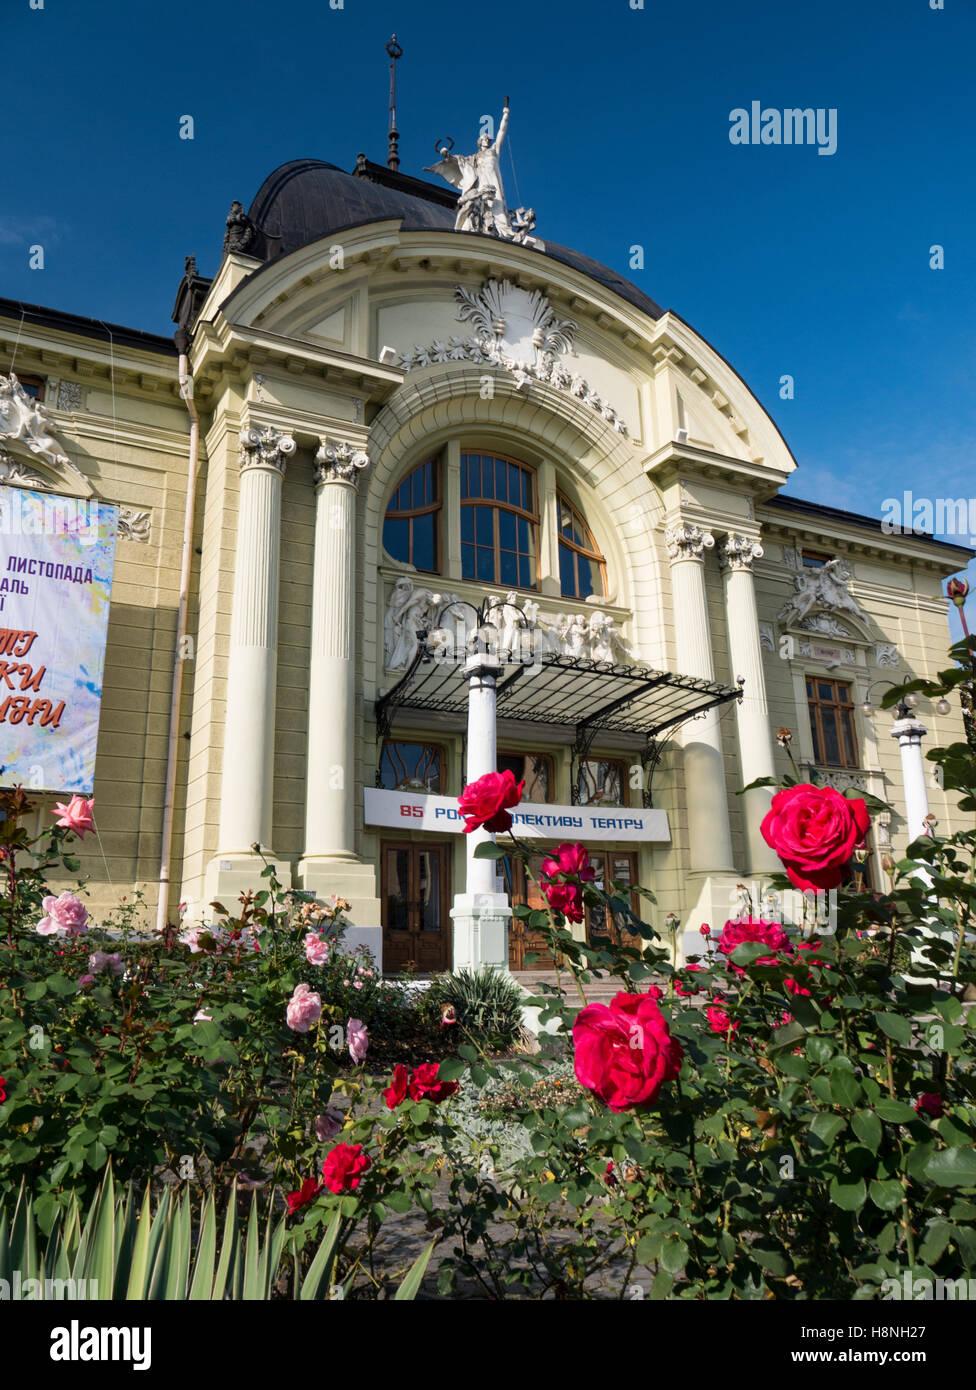 Rose rosse con Chernivtsi Teatro Ucraina anteriore Chernivtsi Teatro in background. Oblast di Chernivtsi Ucraina Foto Stock